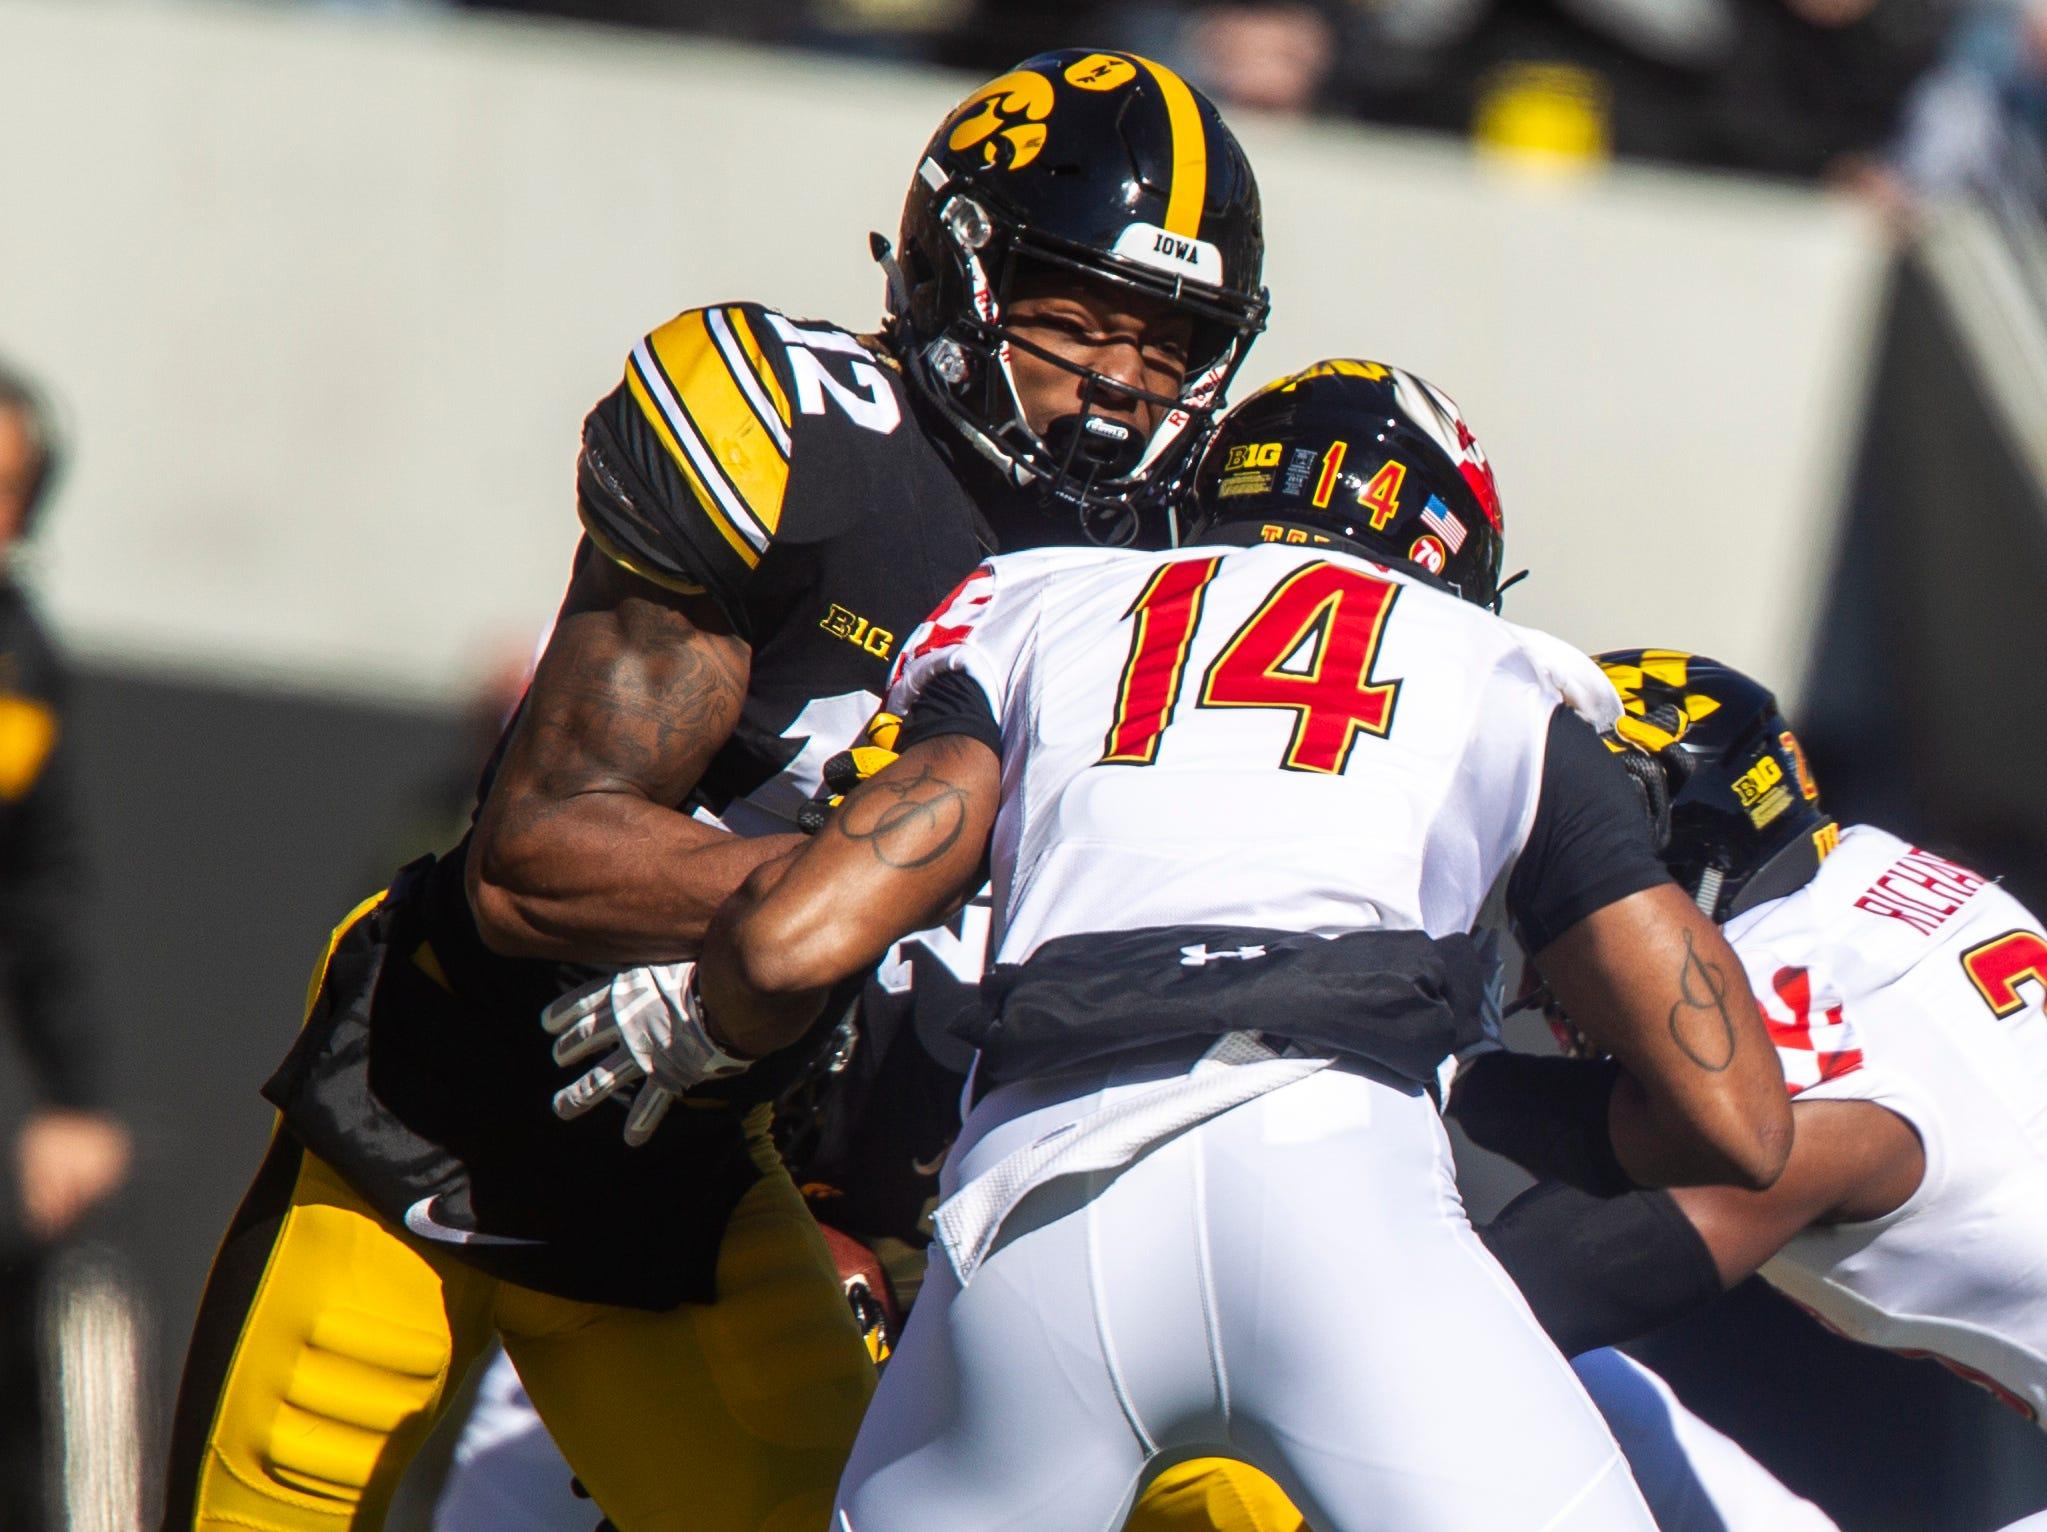 Iowa wide receiver Brandon Smith (12) blocks Maryland defensive back Deon Jones (14) during an NCAA Big Ten conference football game on Saturday, Oct. 20, 2018, at Kinnick Stadium in Iowa City.